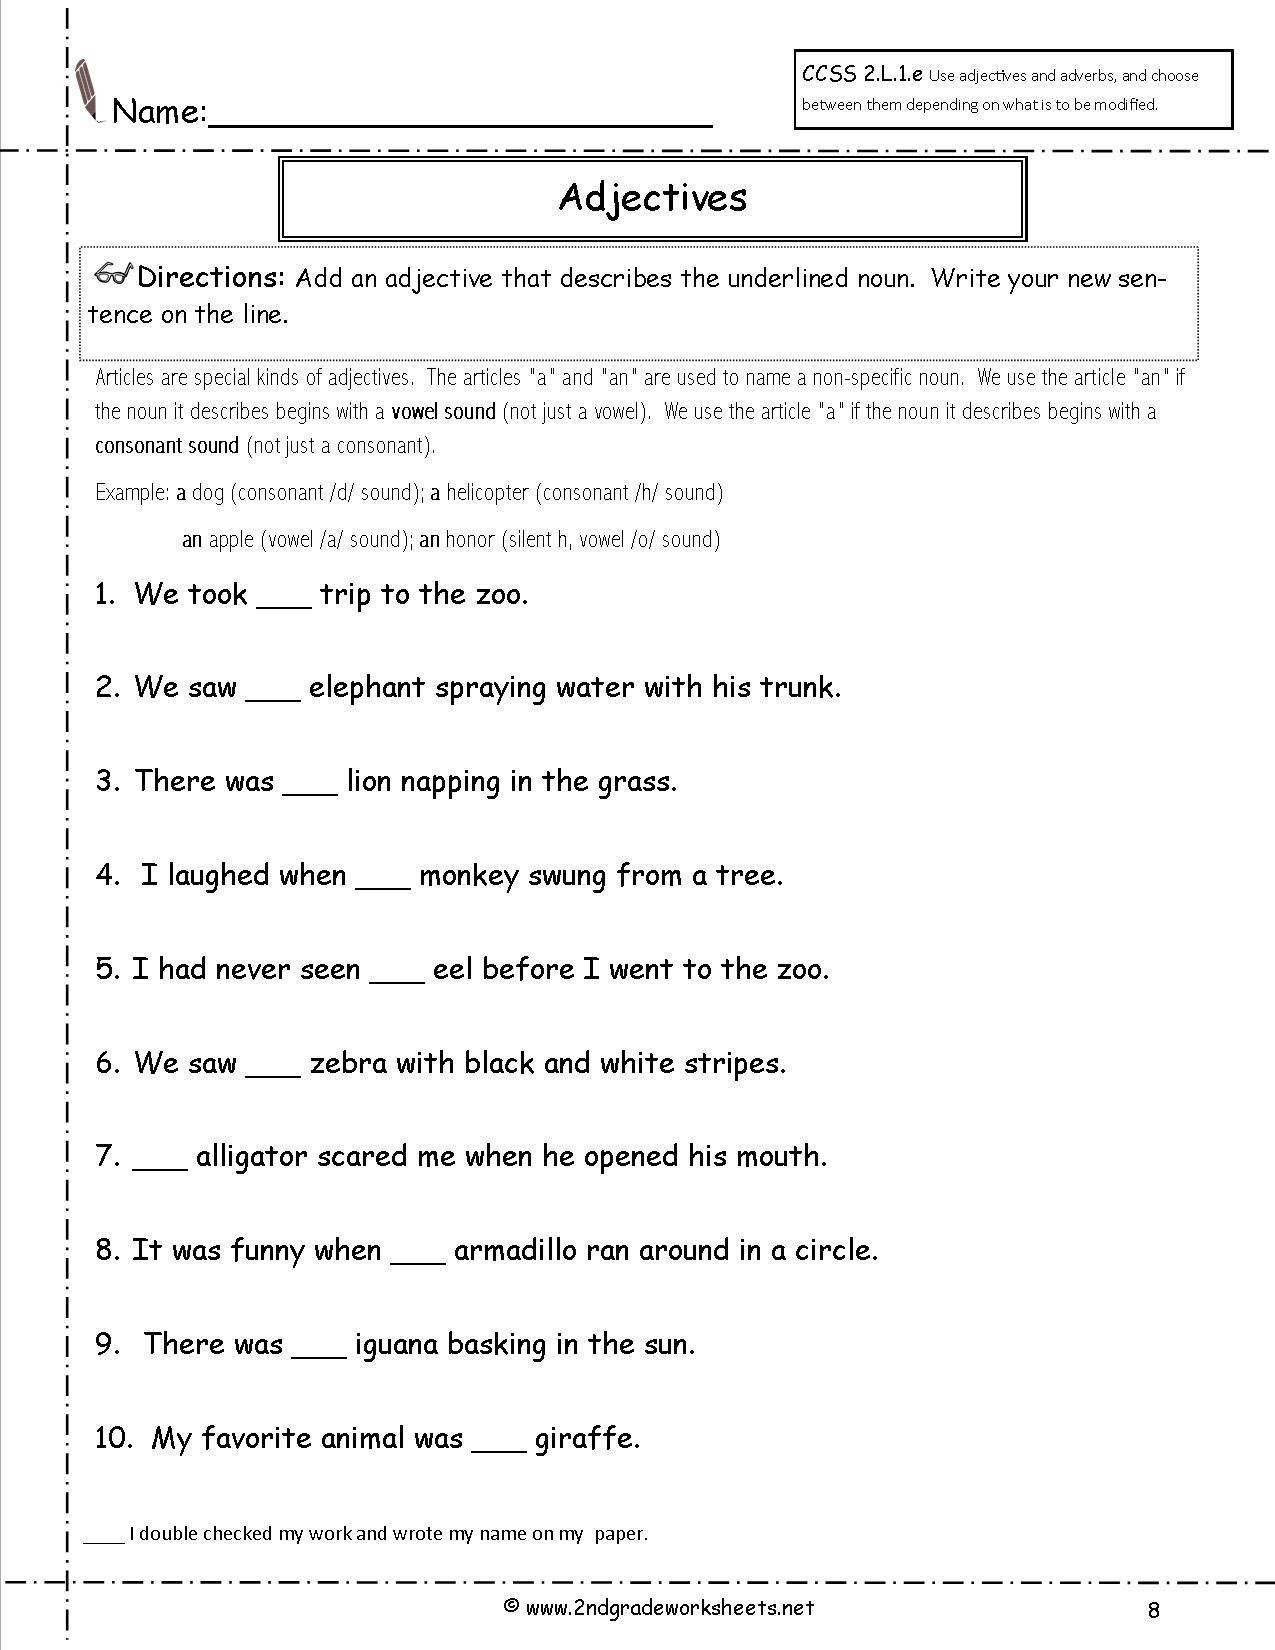 42 Printable Worksheets English Grammar In